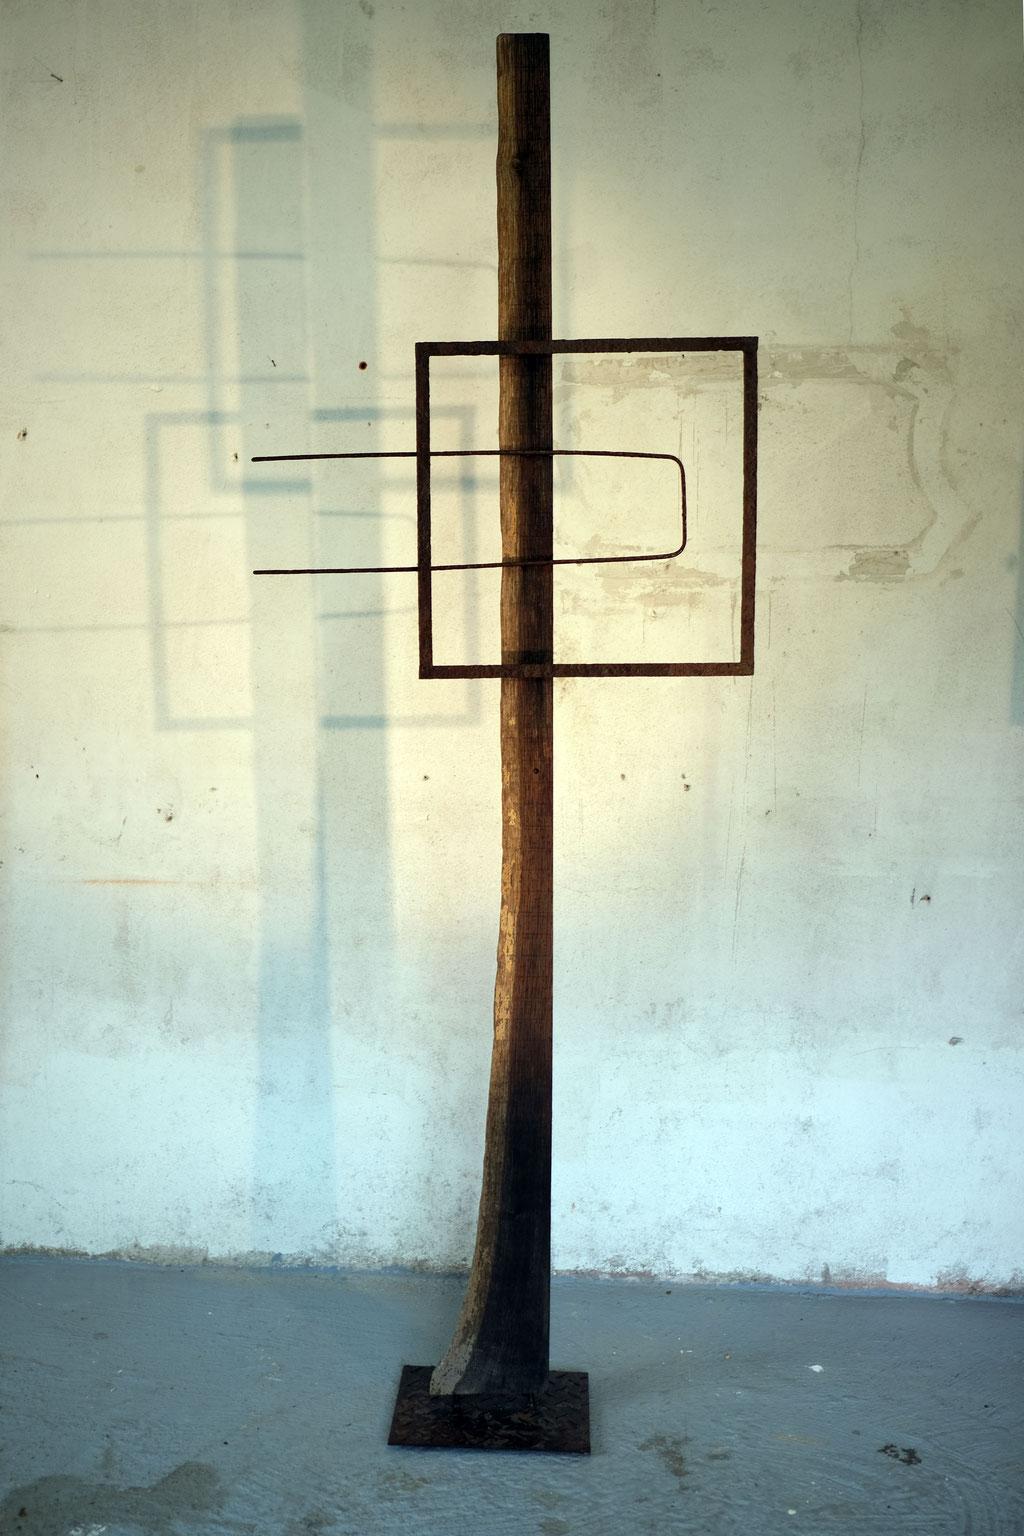 Stele, Objekt, Kunst, Wolfgang Wallner, Hall in Tirol